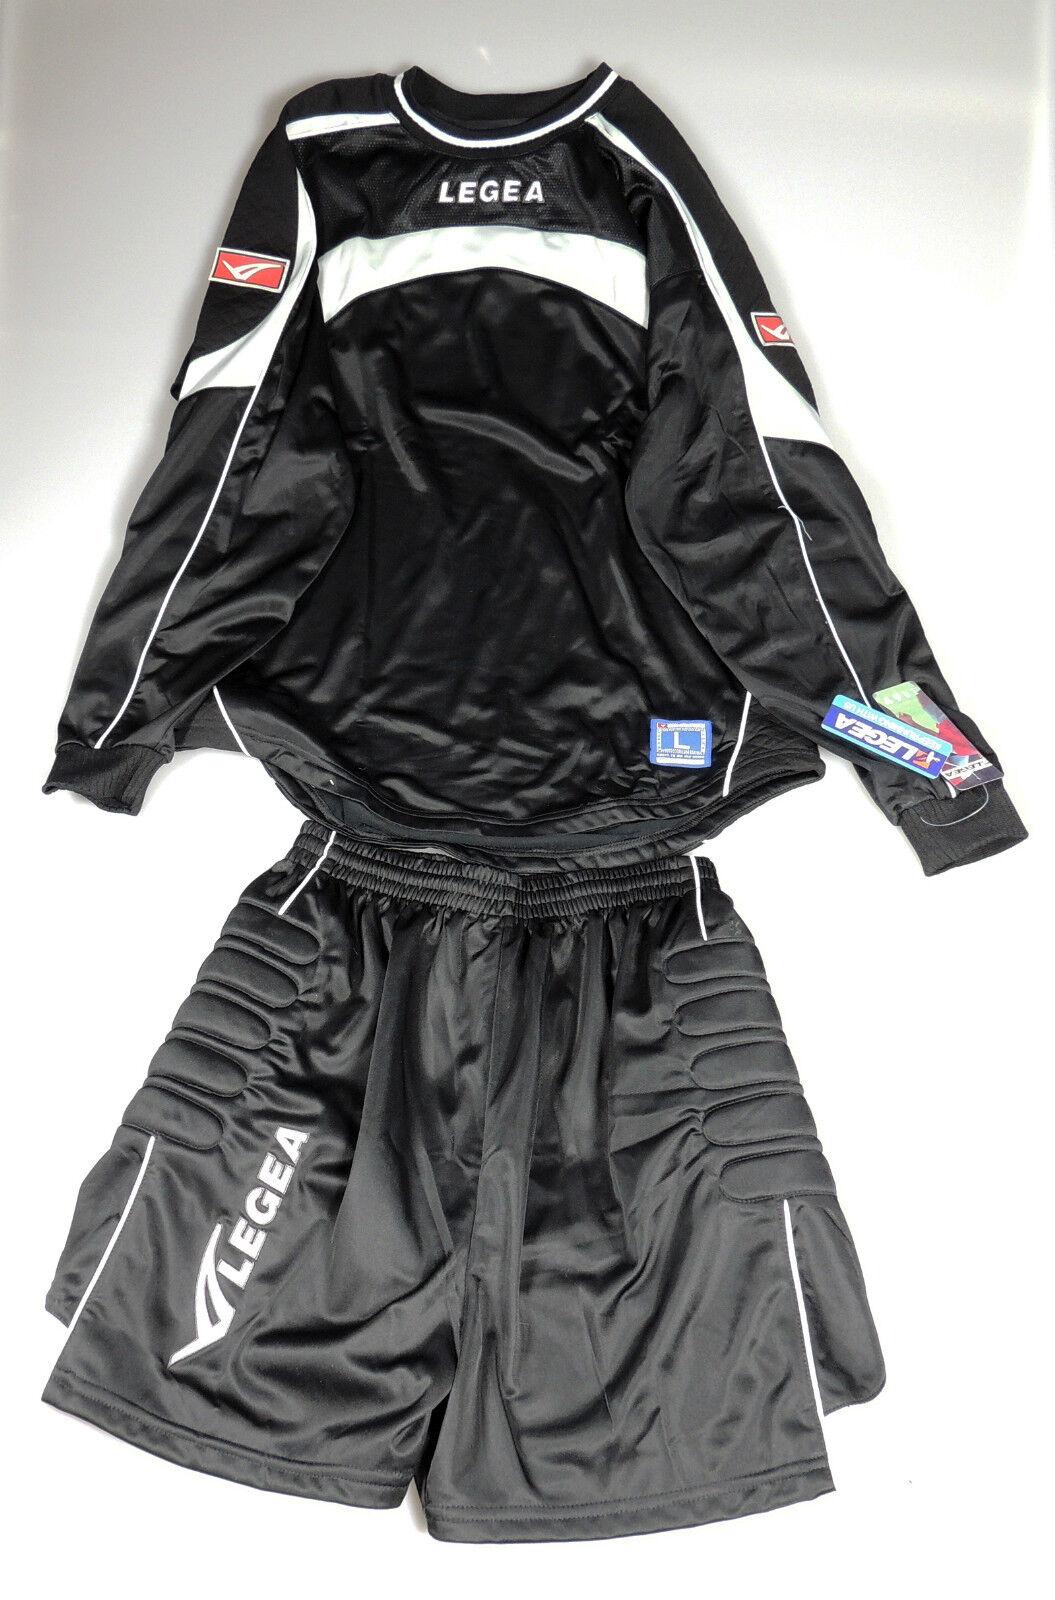 NEW Legea Adult Soccer Uniform Goakeeper Kit Jersey & Shorts (Retail )